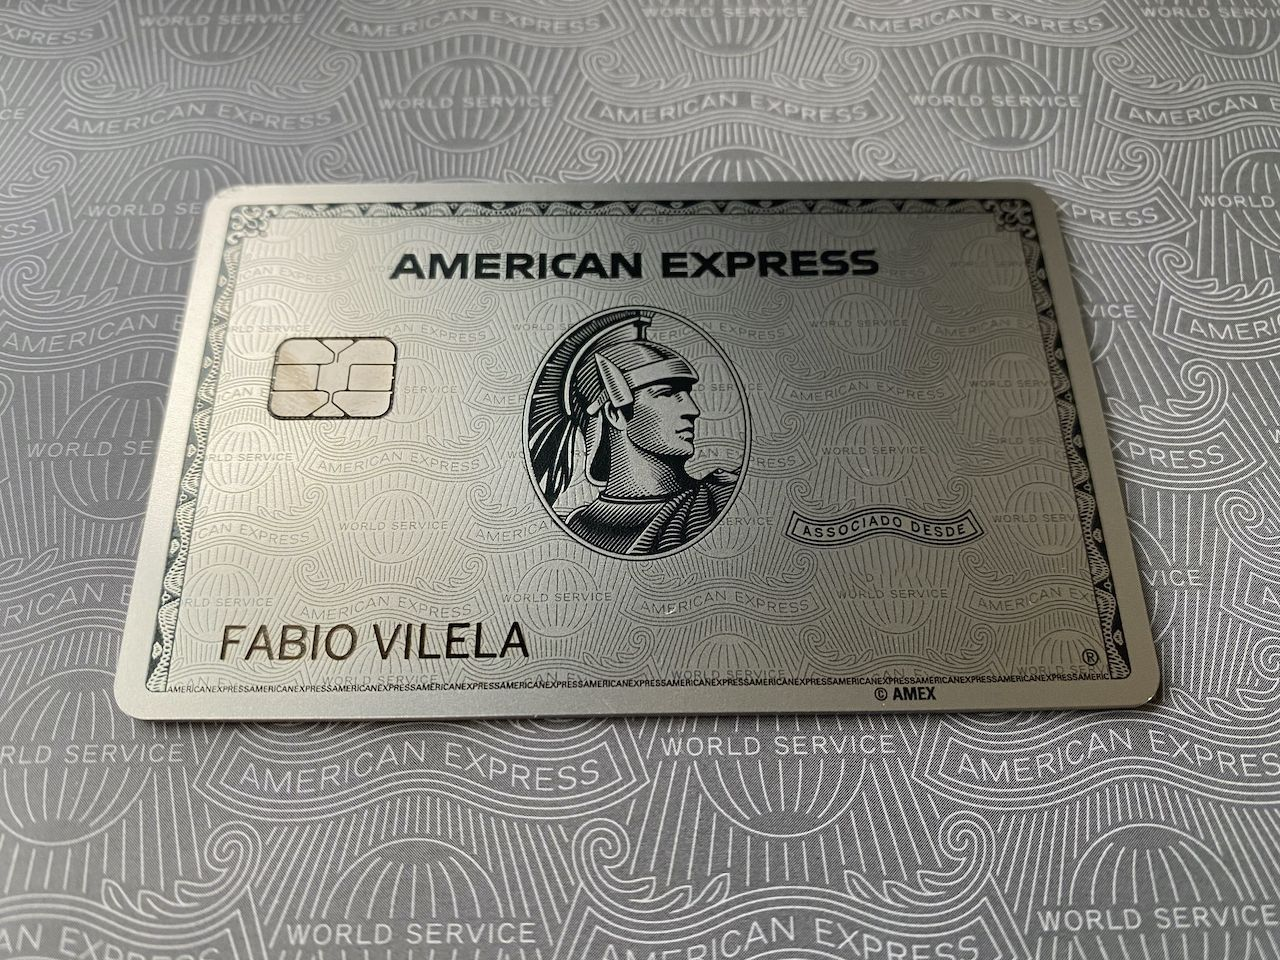 The Platinum Card American Express metal Bradesco